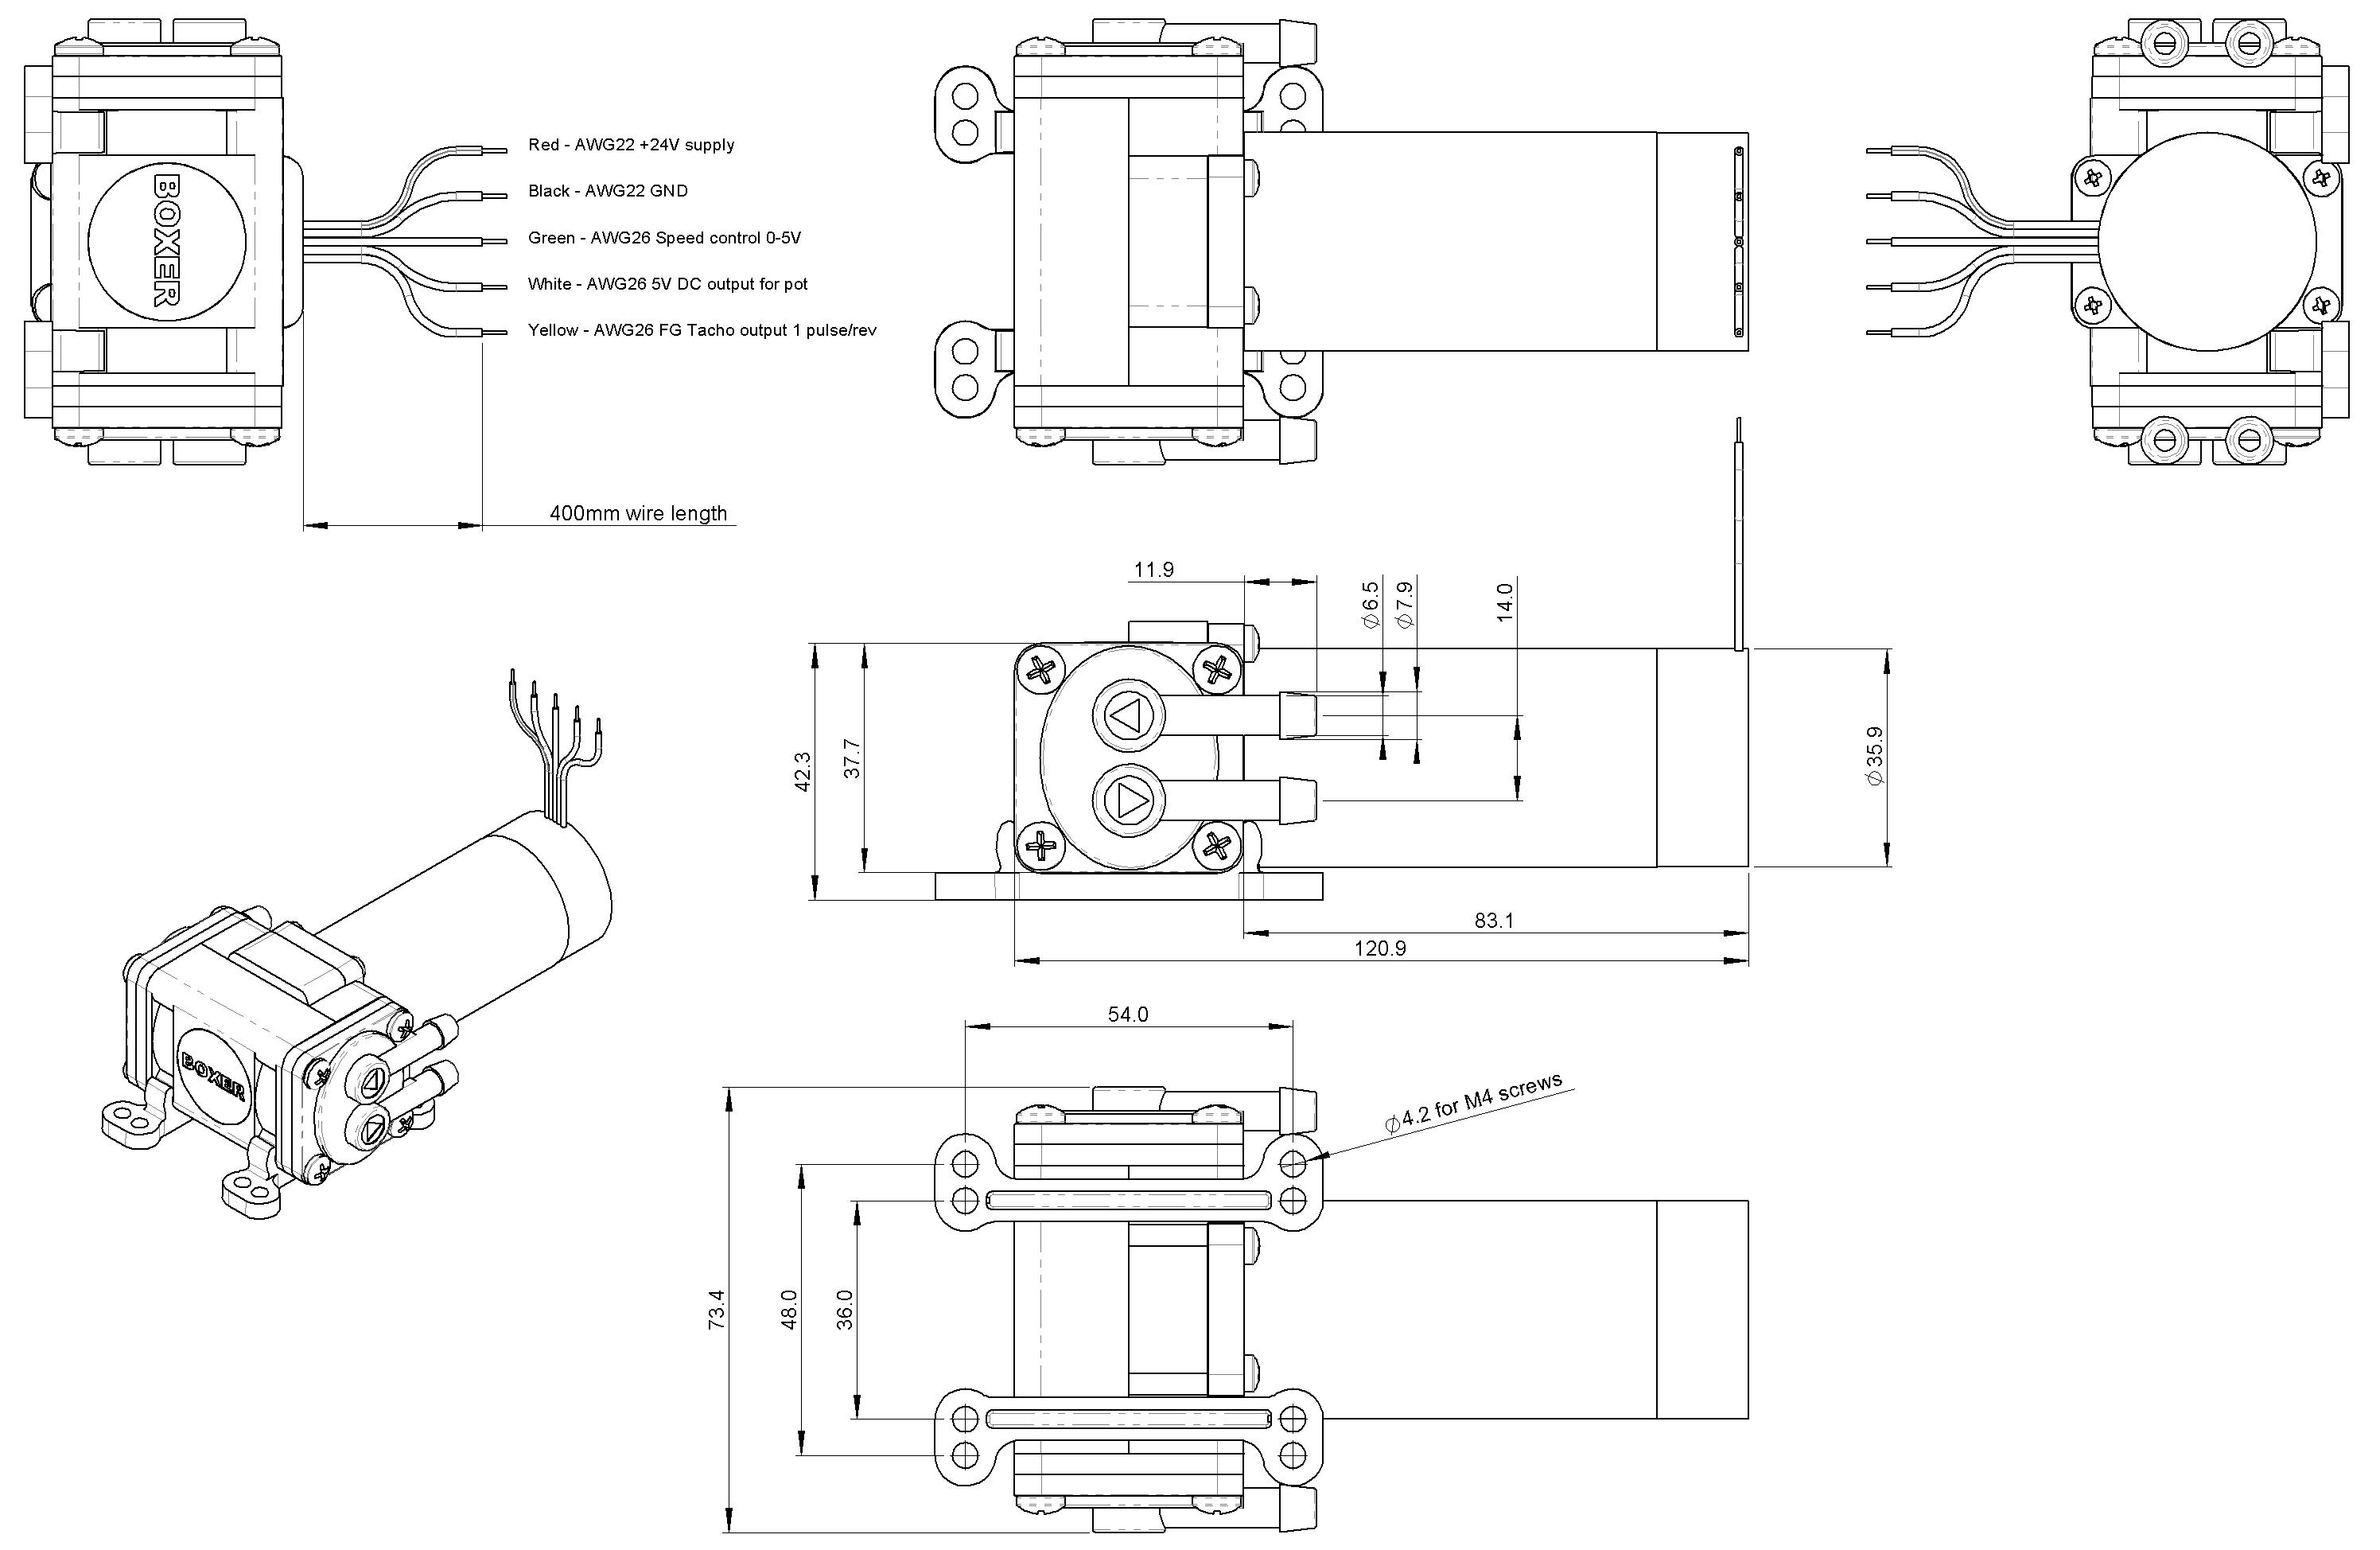 diaphragm pump wiring diagram 98 kia sephia fuel pump wiring diagram fuel pump diaphragm pump wiring diagram | wiring library